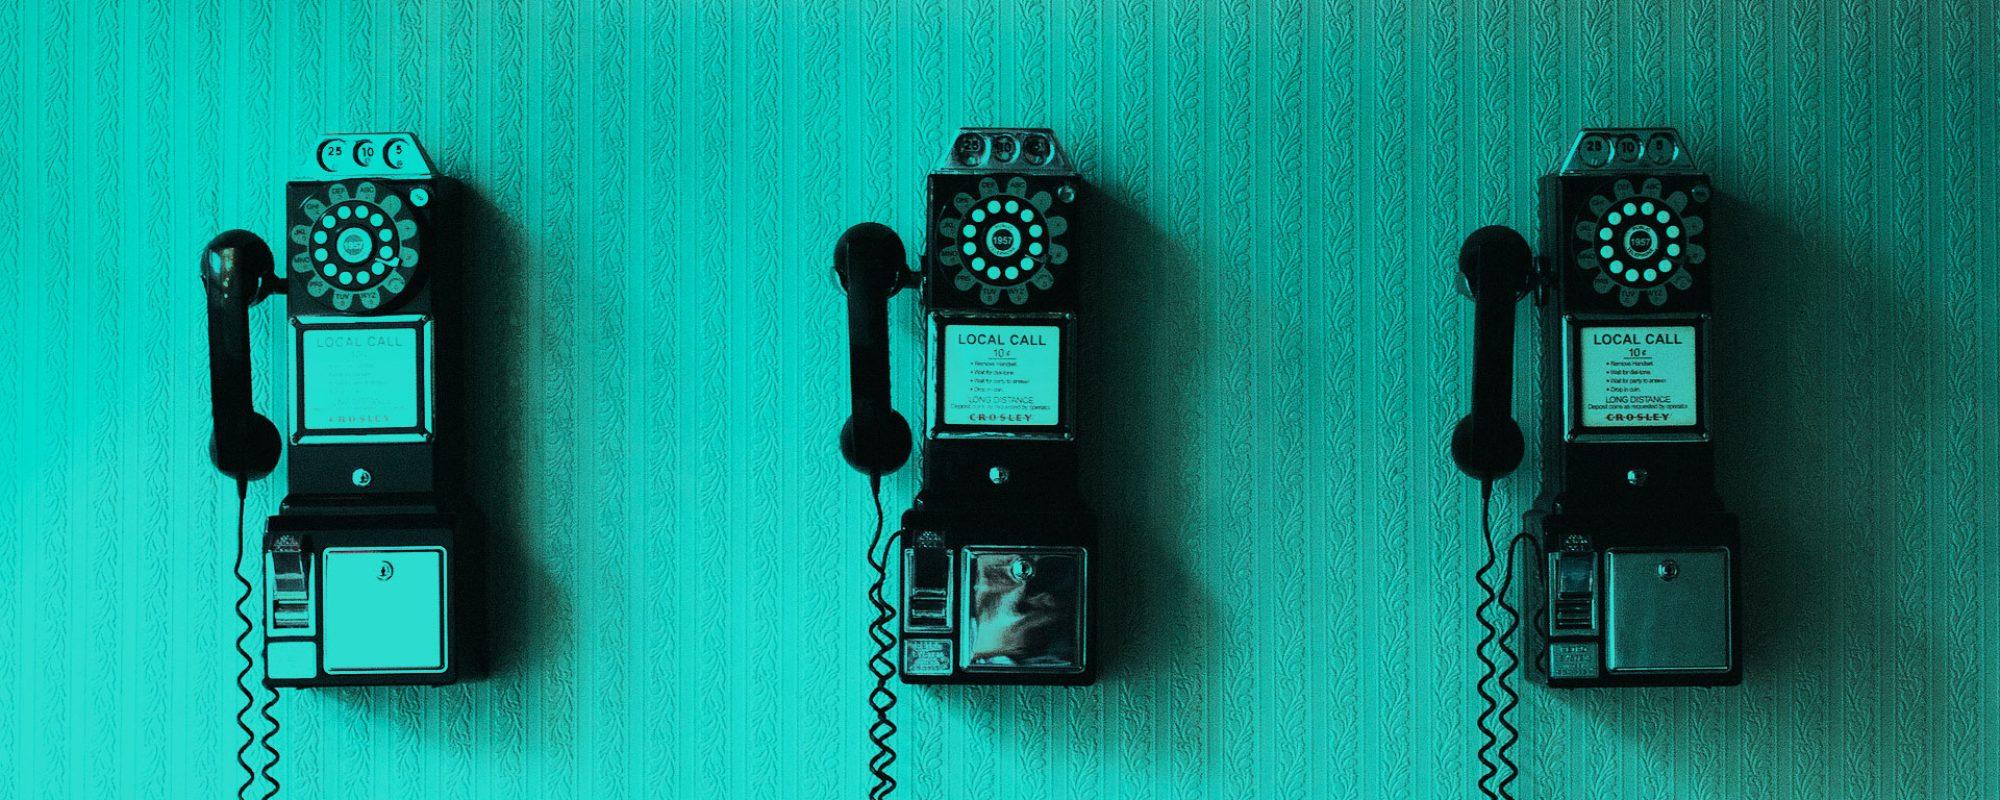 contactar-agencia-marketing-web-app-disenyo